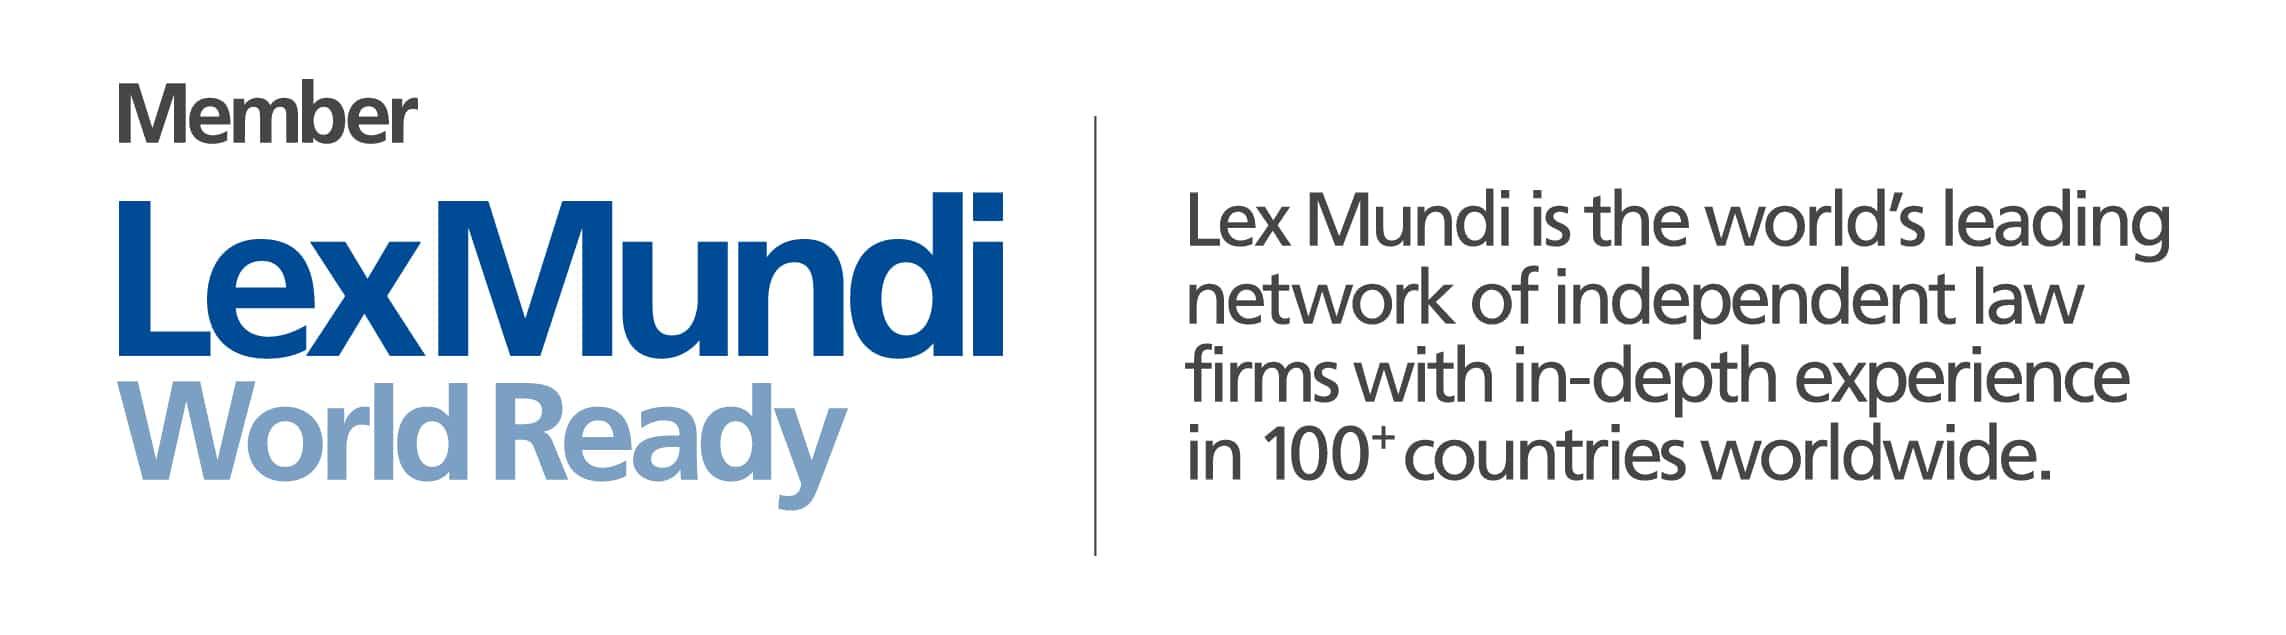 Lex Mundi Member